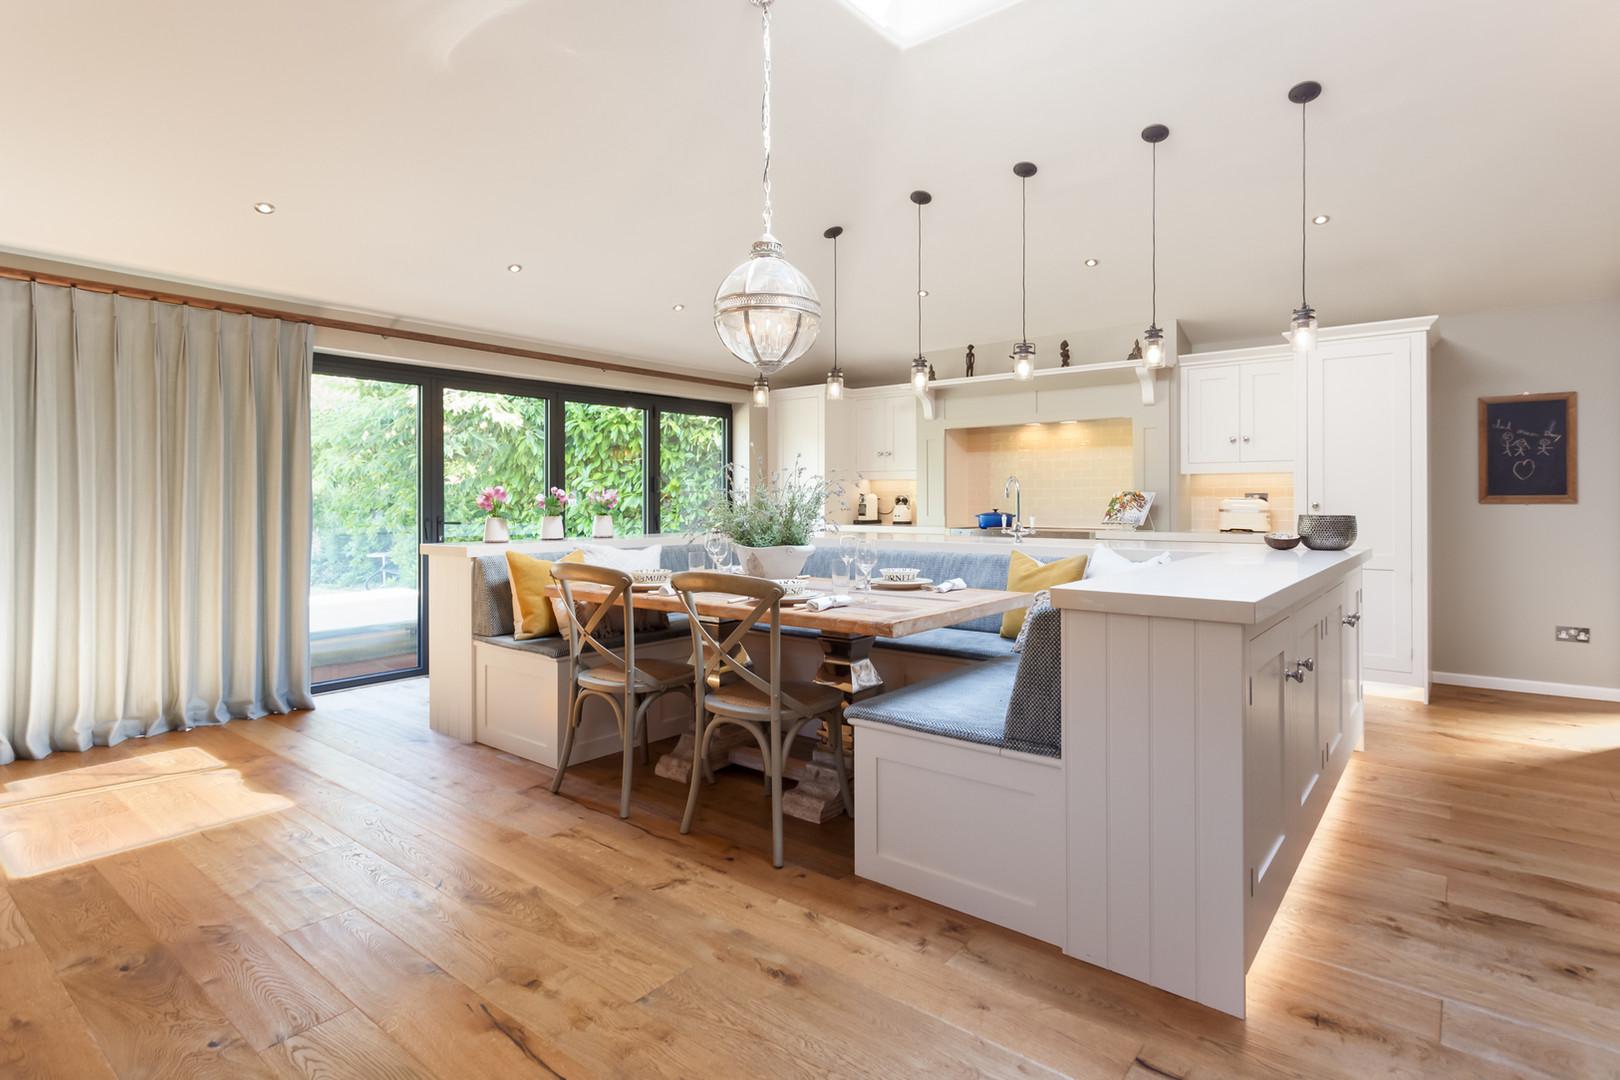 kitchen custom built interior design.jpg